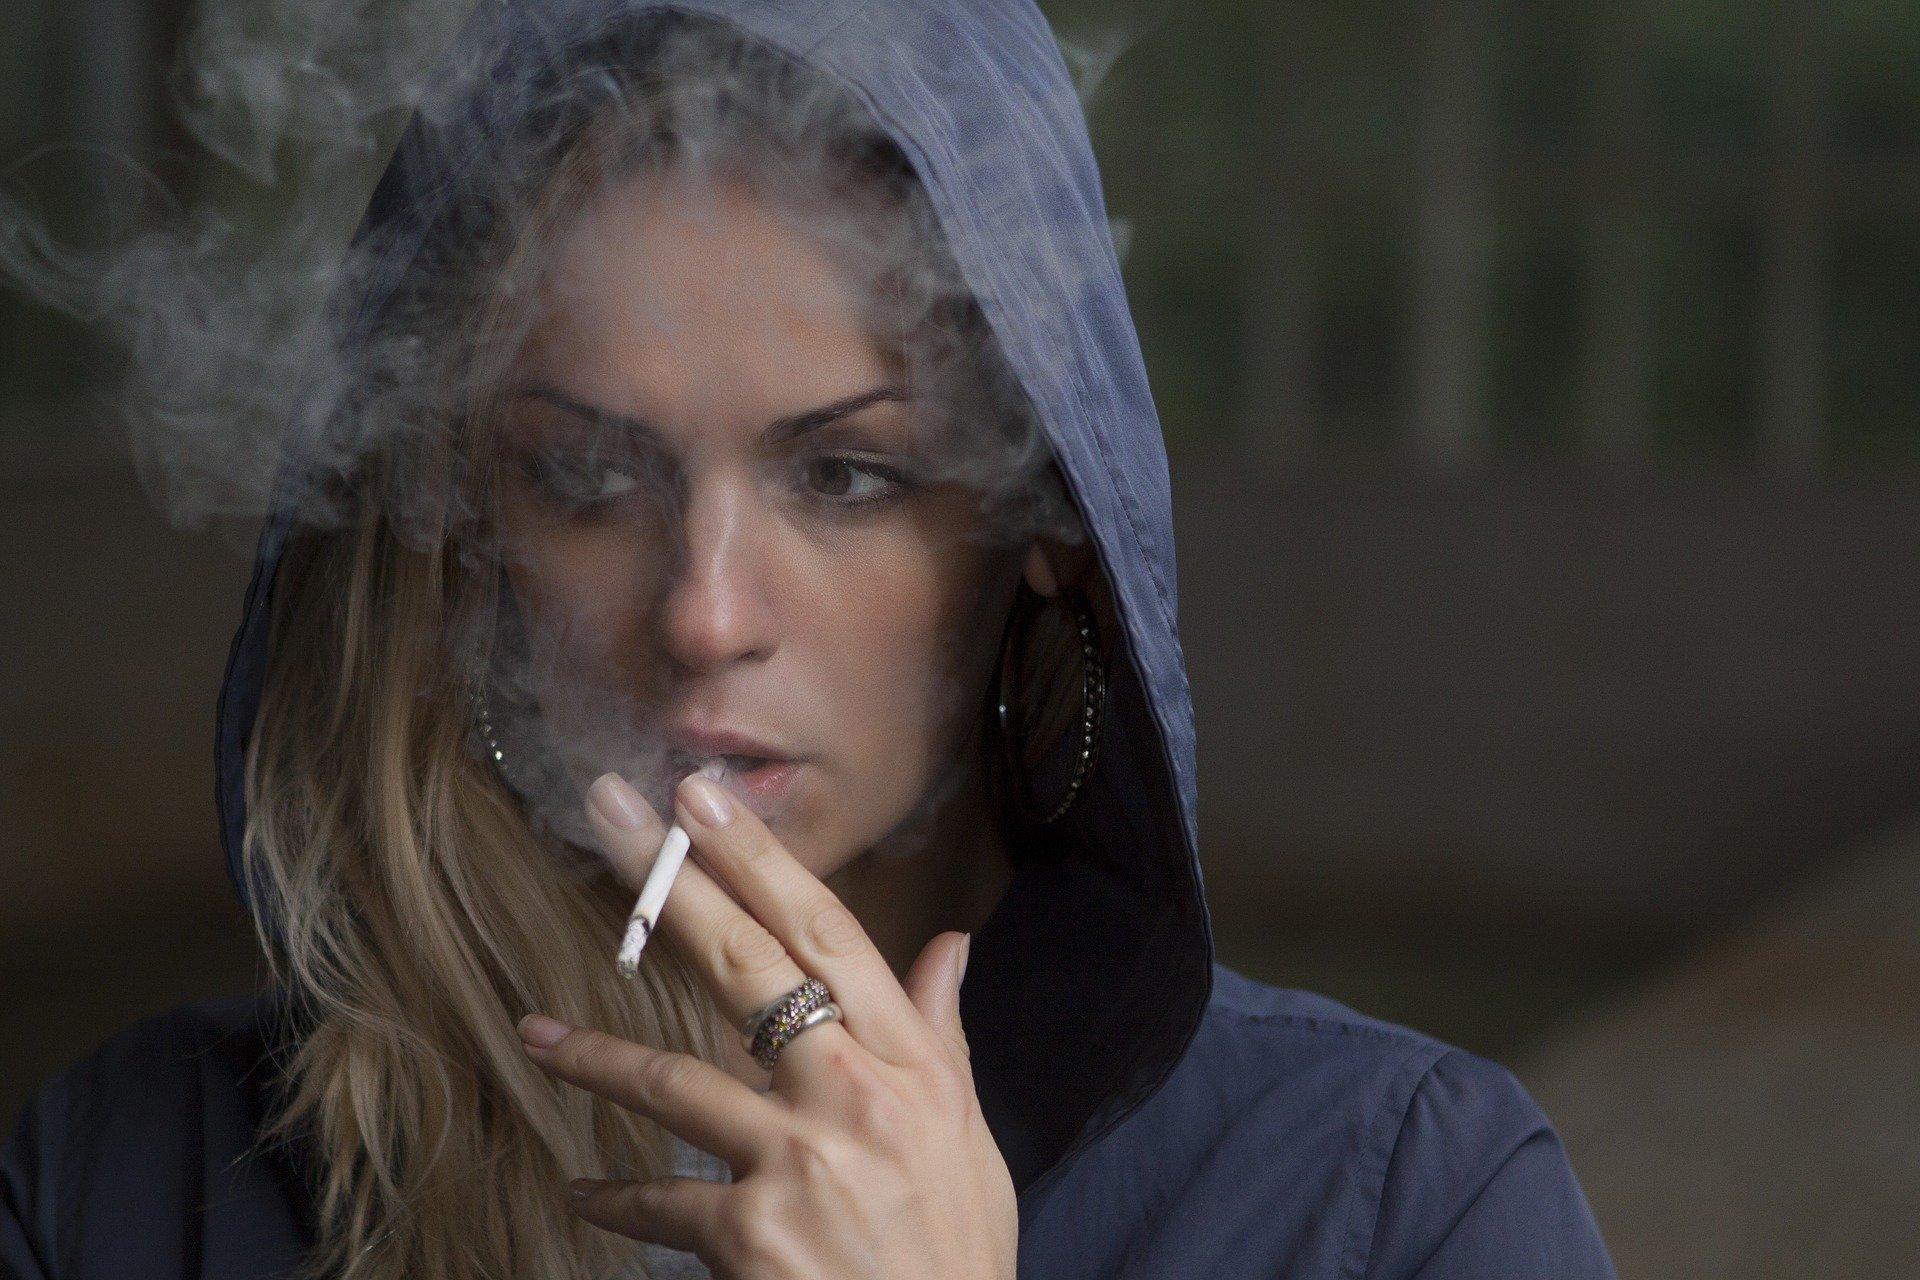 Binge eating and smoking linked to bullying and sexual abuse